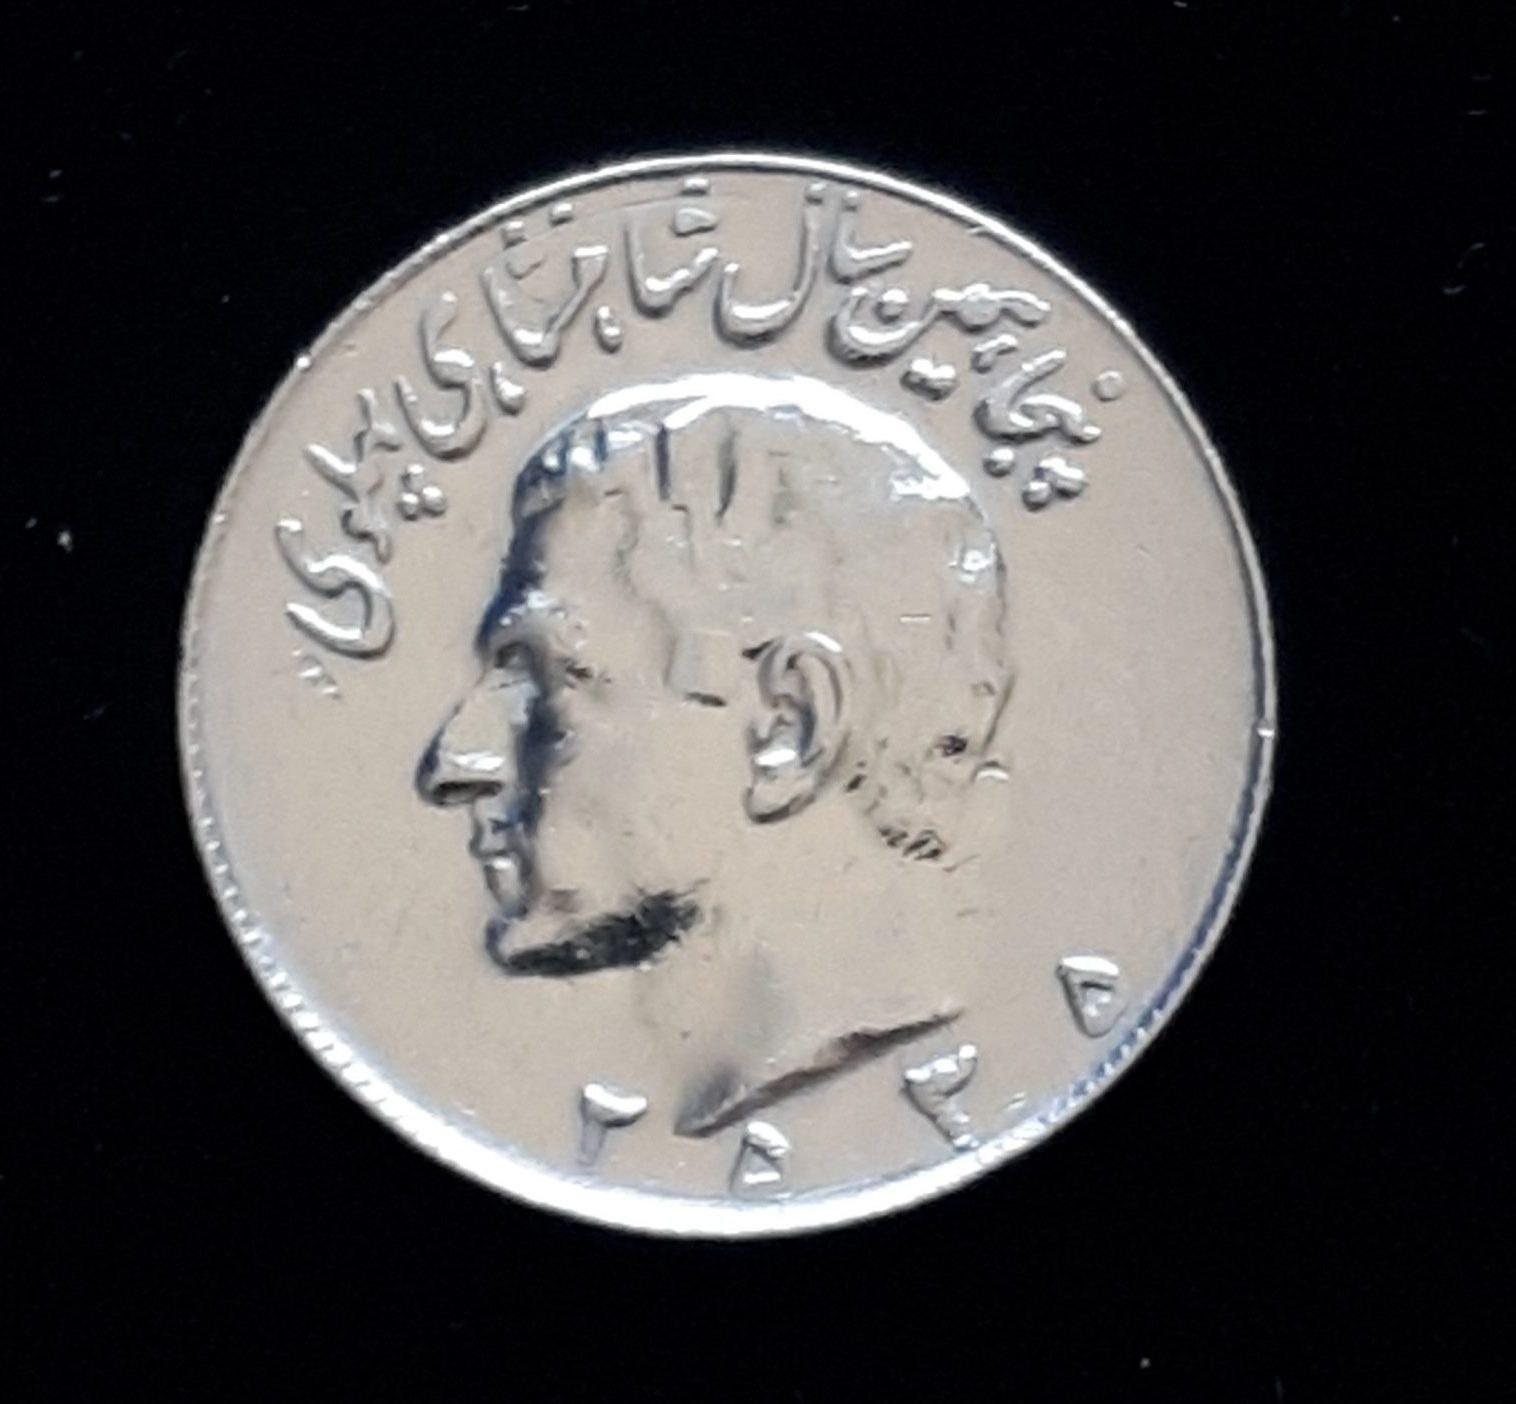 تصویر سکه 10 ریال محمدرضا شاه پهلوی